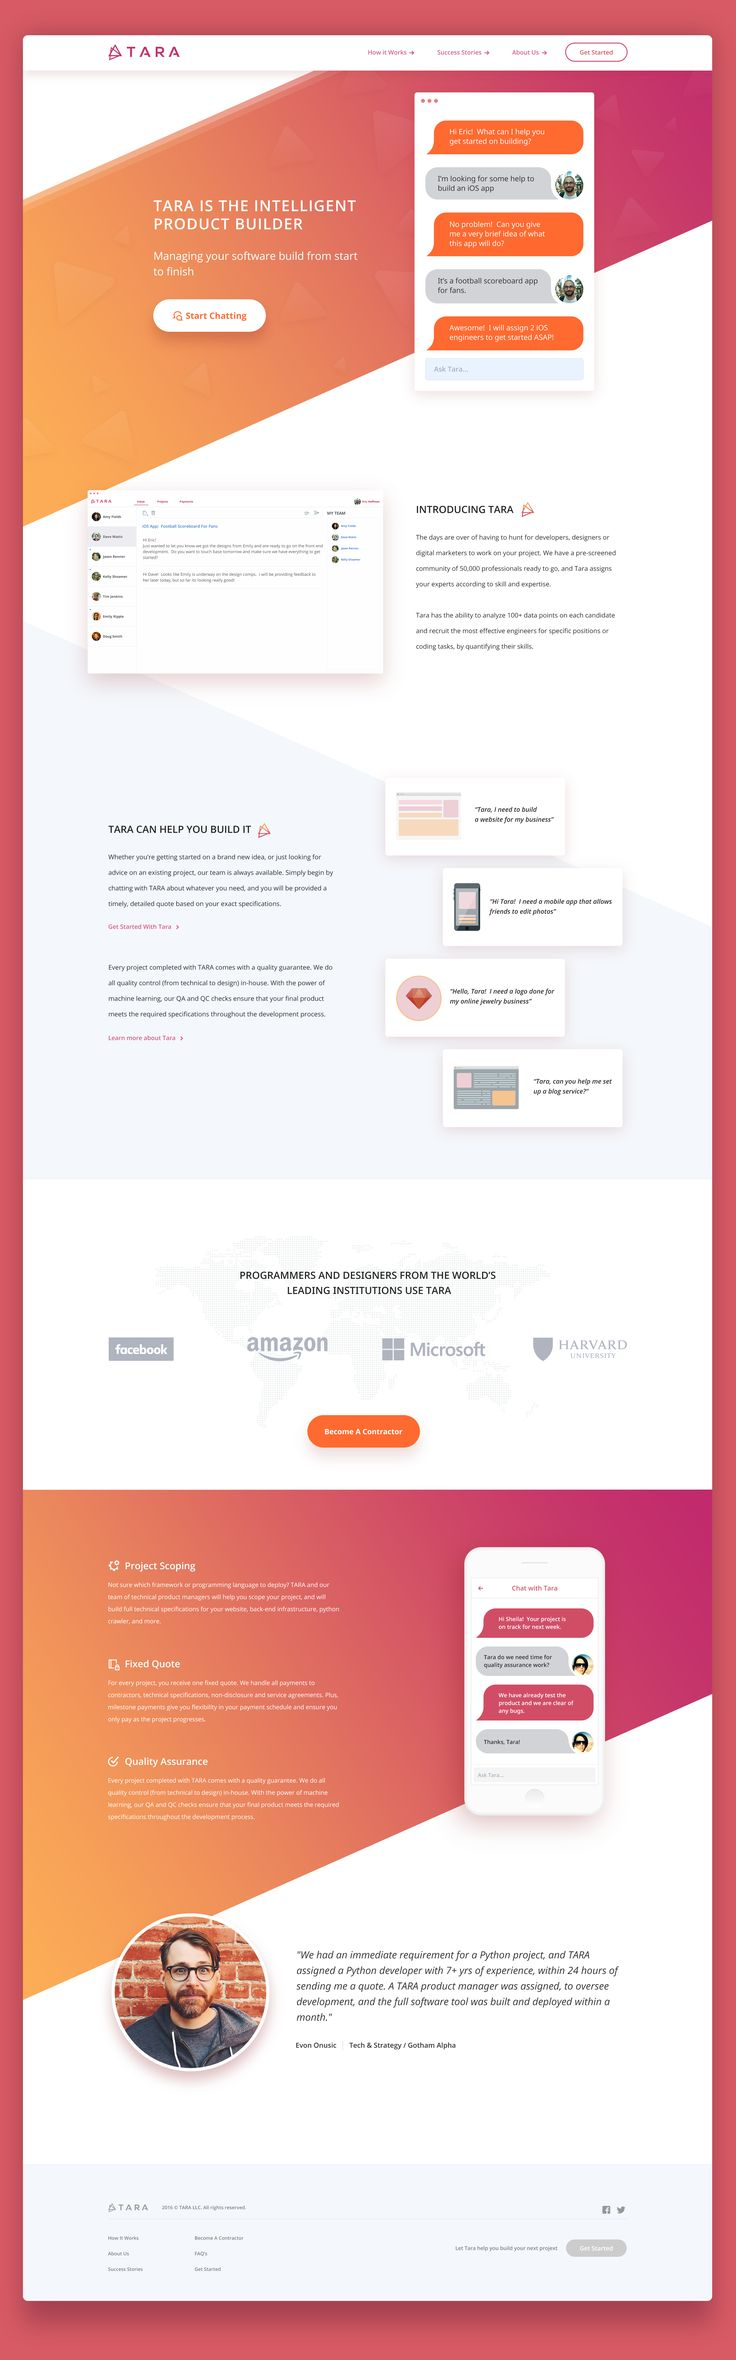 Best Web Design  Flat Material  Images On